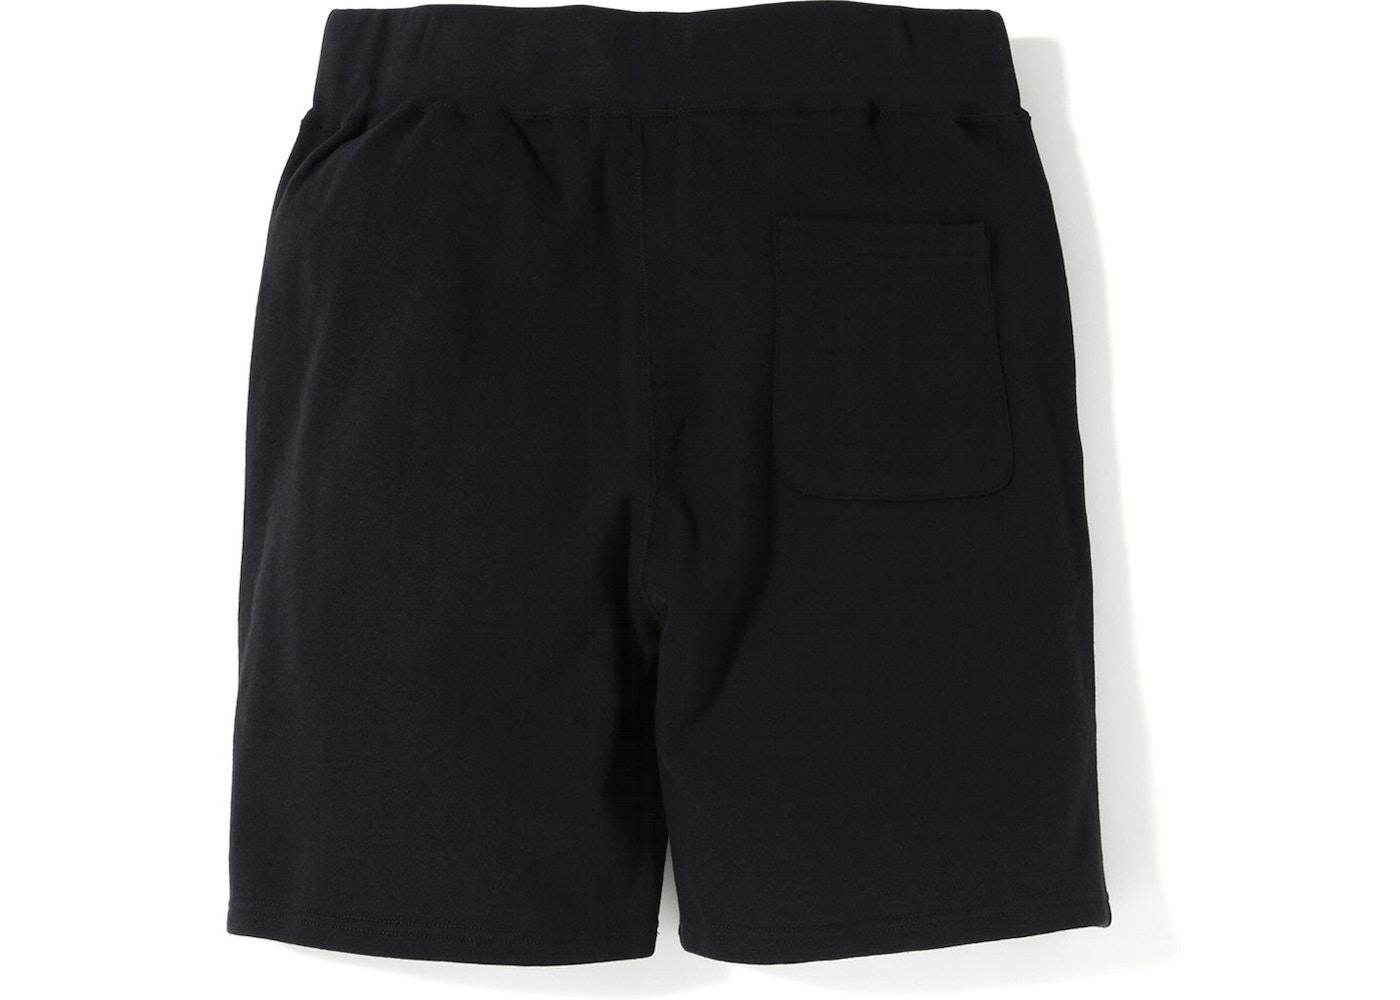 657b94b3 BAPE Sakura Sweat Shorts Black - SS19